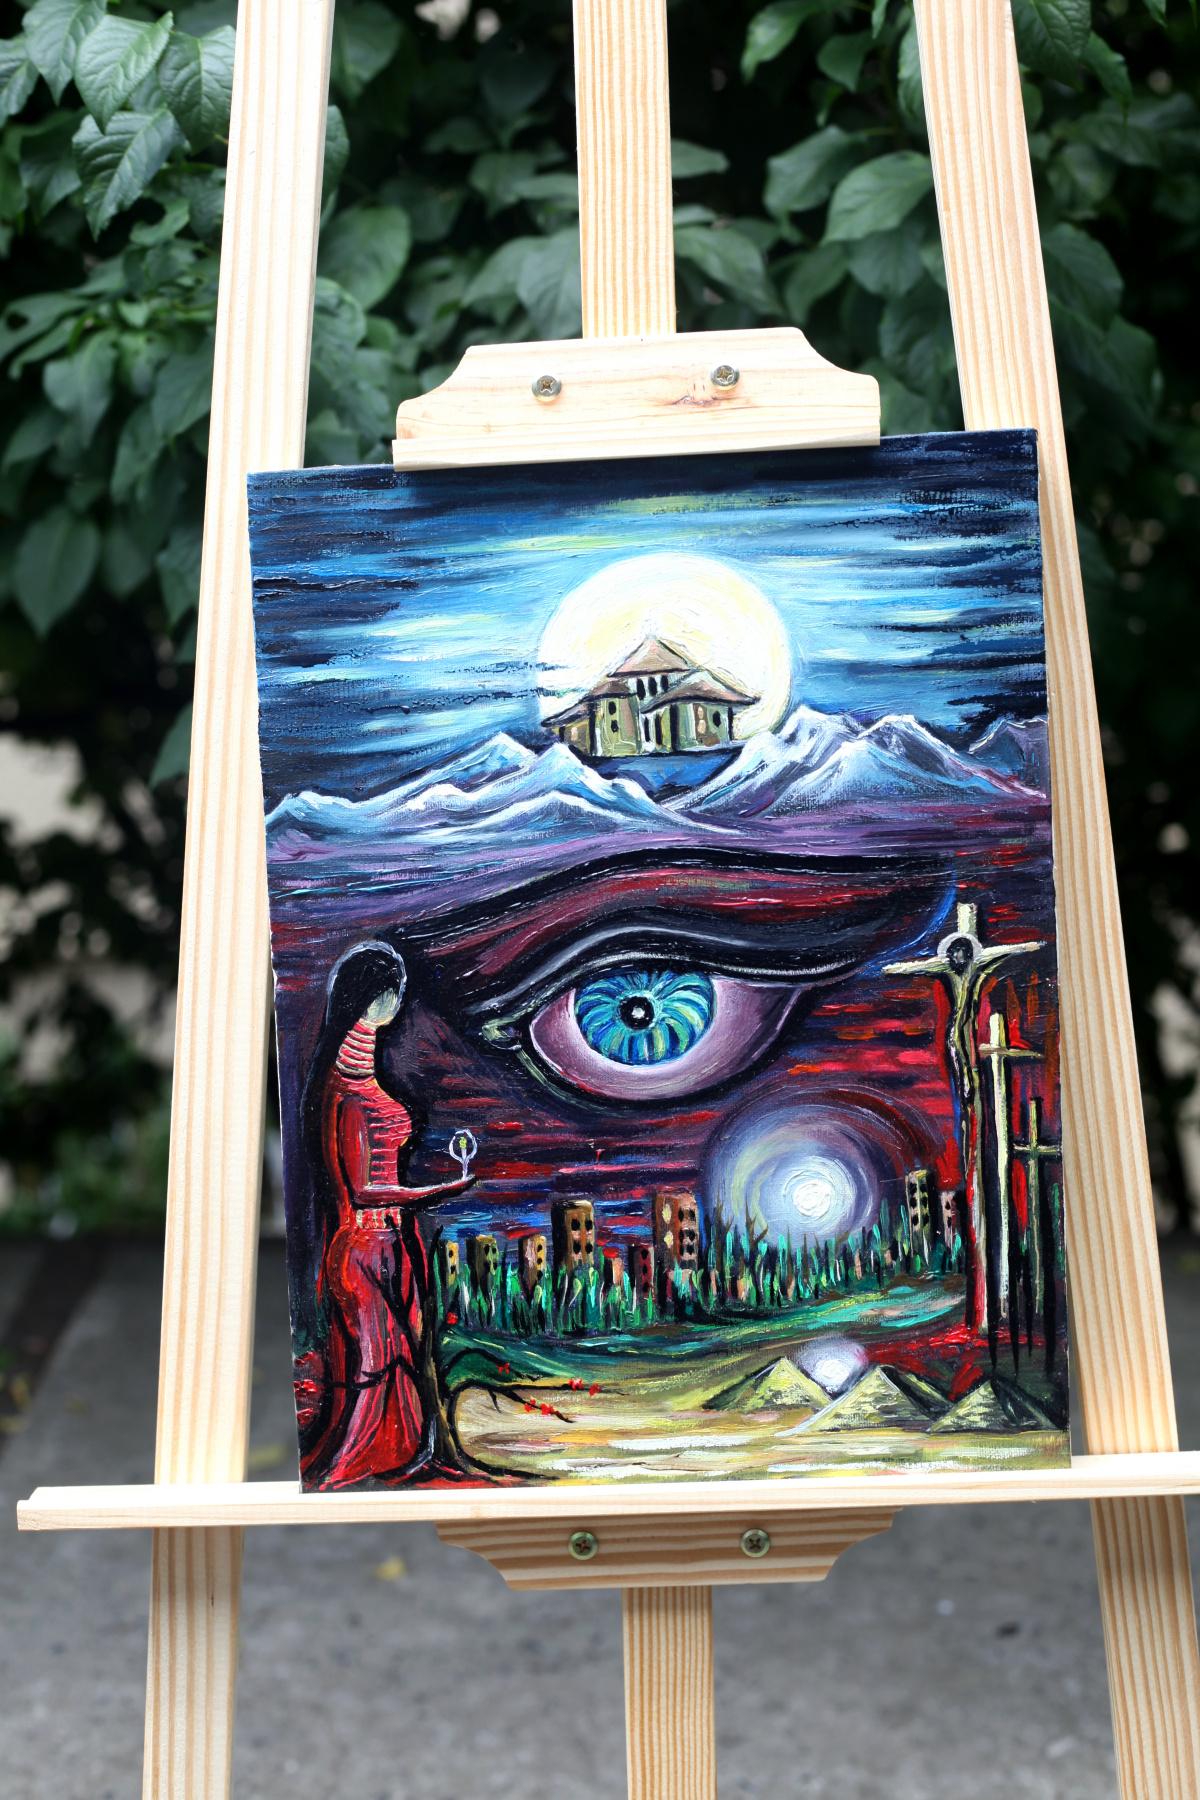 Michael Tchitchinadze (13). Art Intimate - canvas 40 x 30. oil. Price 550 dollars